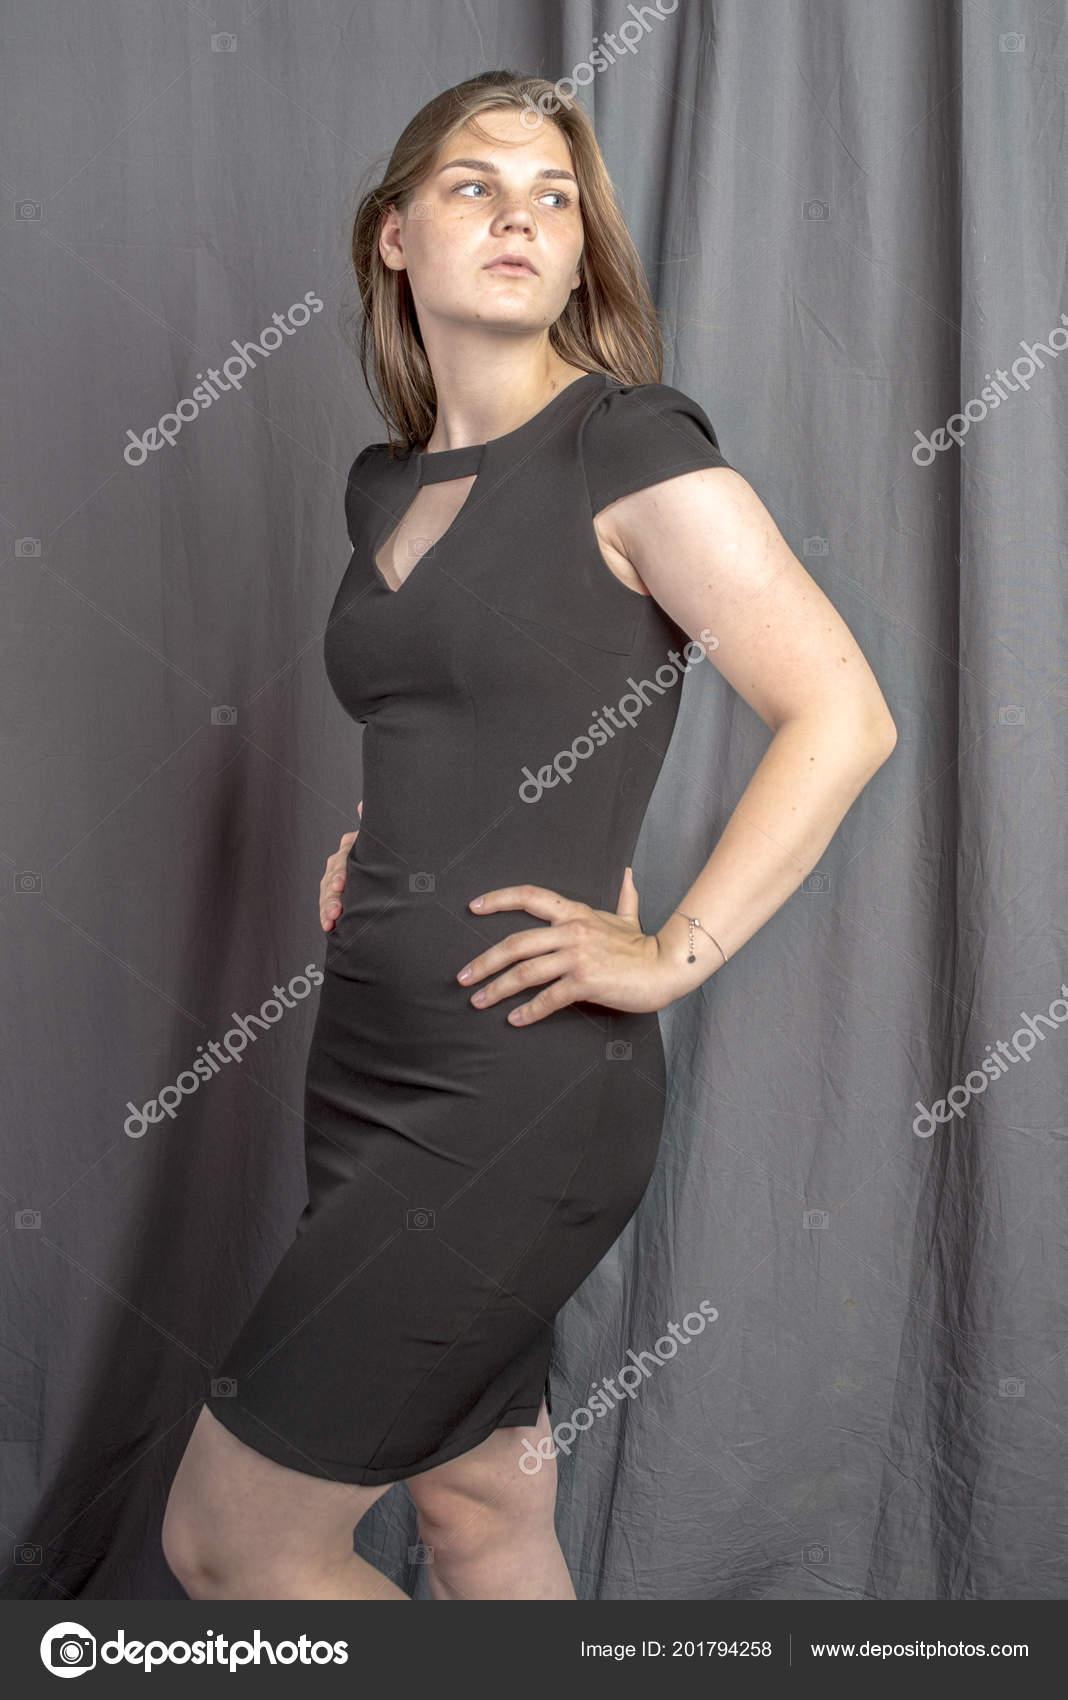 Vestido negro deportivo